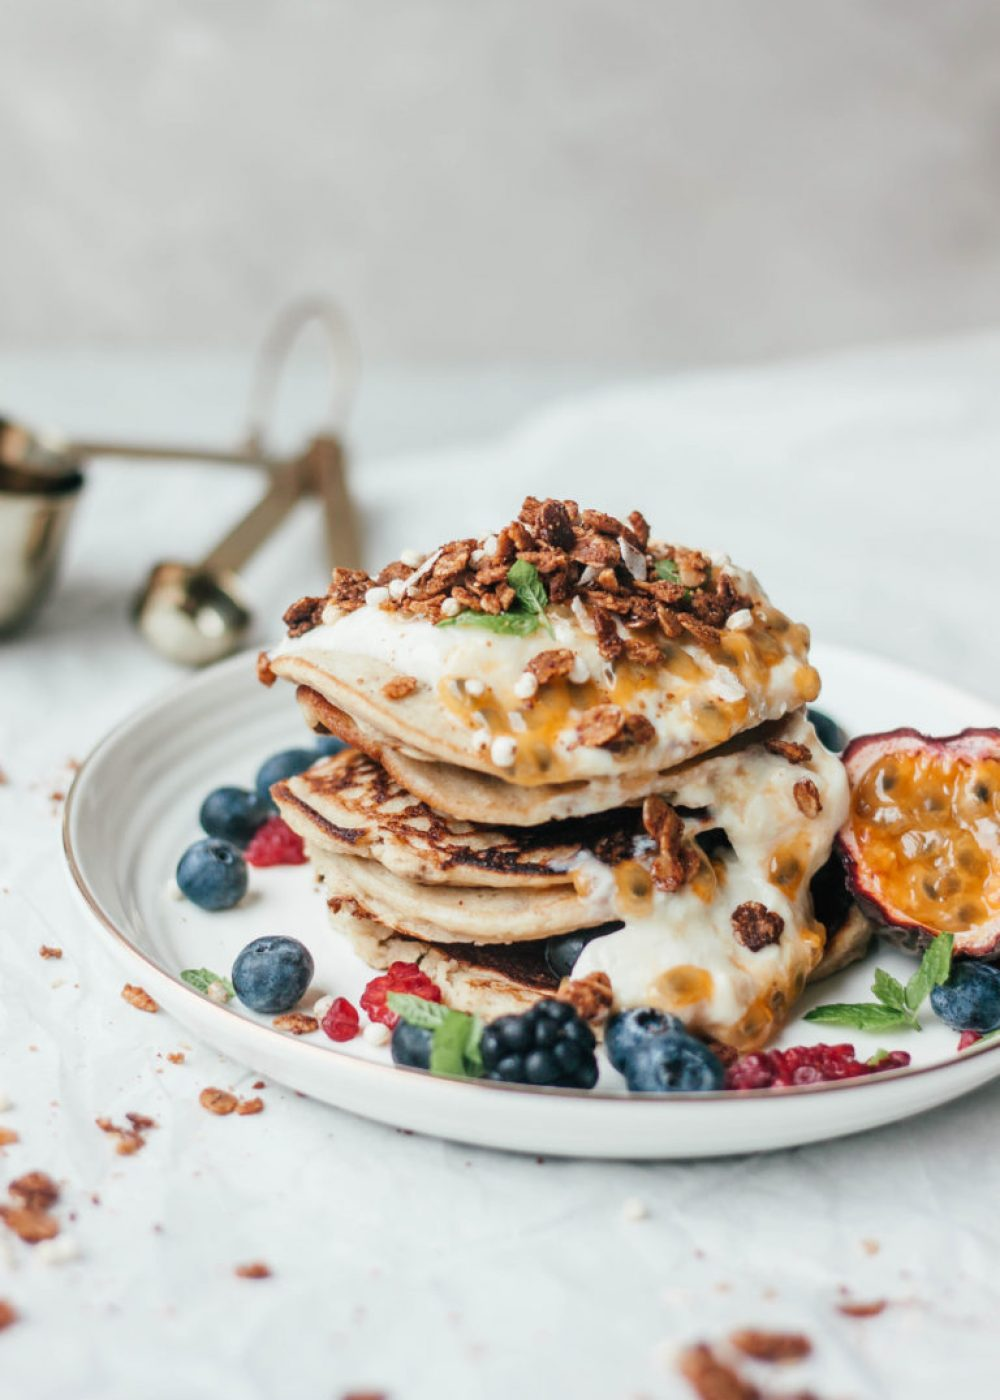 Helen's Banana Pancakes